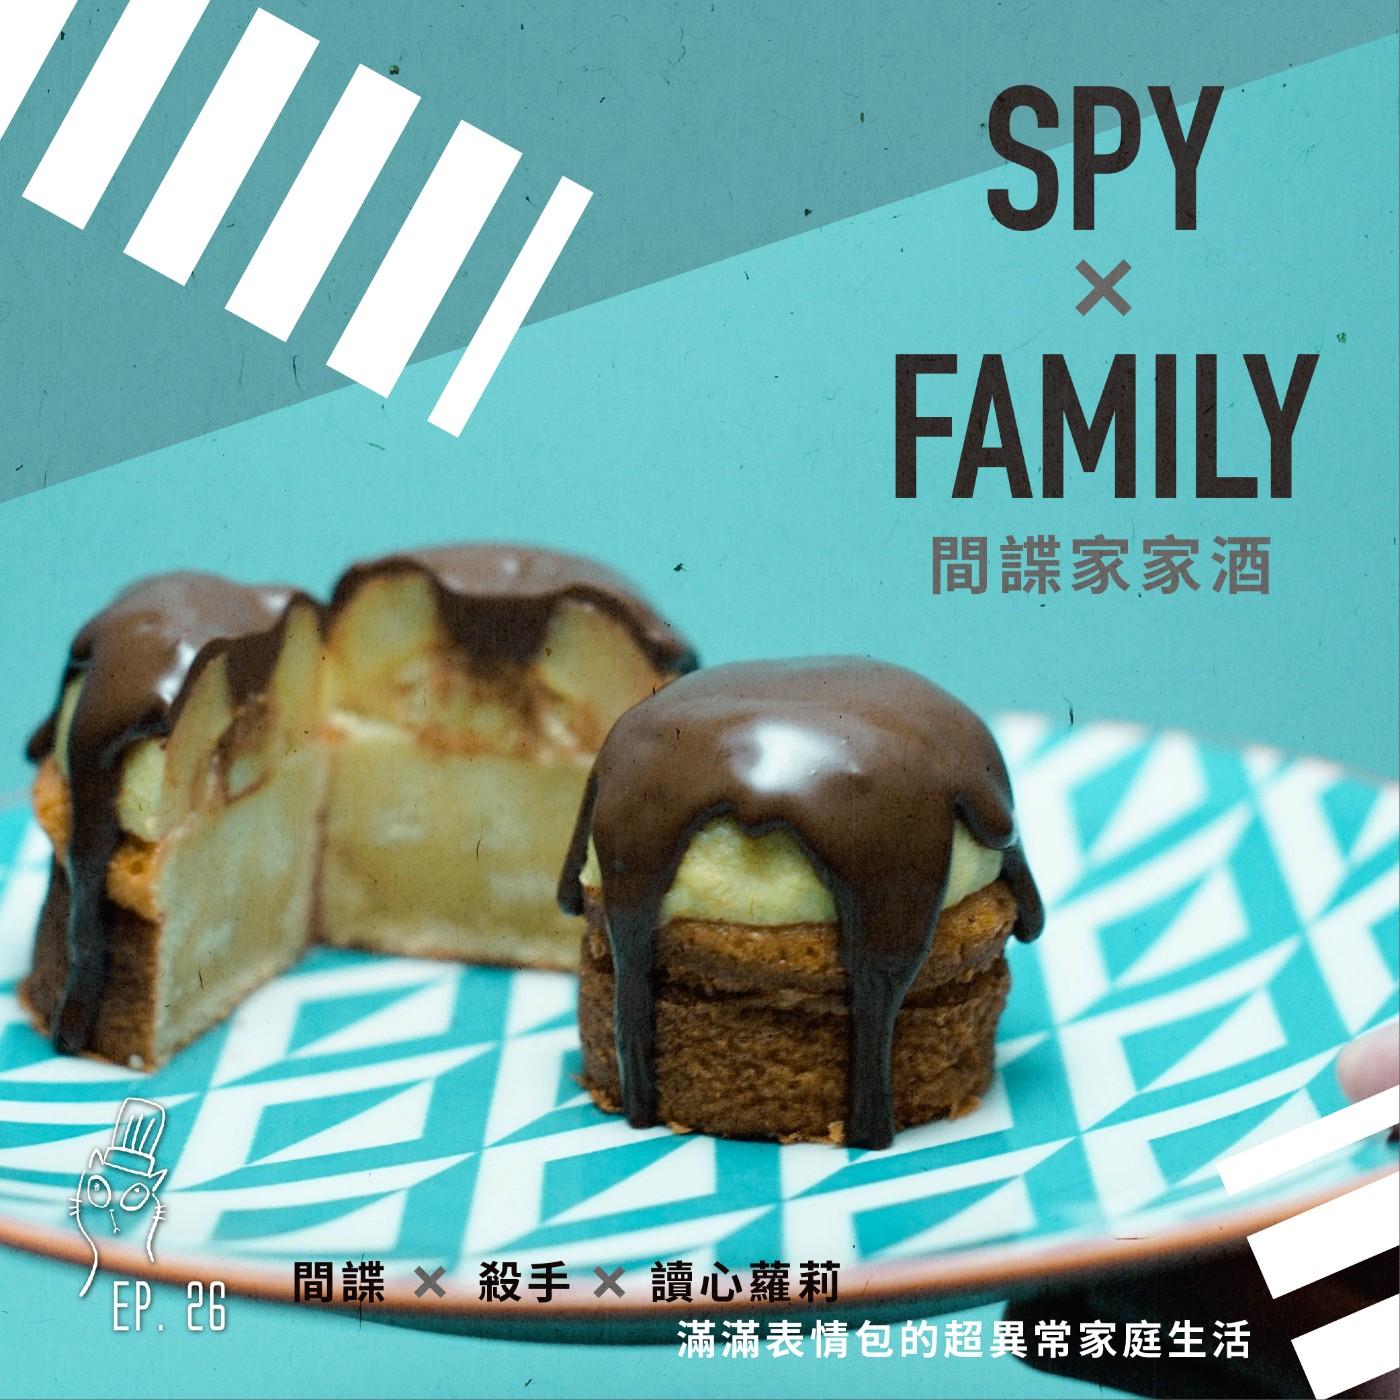 EP.26 SPY x FAMILY 間諜家家酒-間諜特務x超強女殺手x讀心超能力蘿莉的搞笑溫馨日常